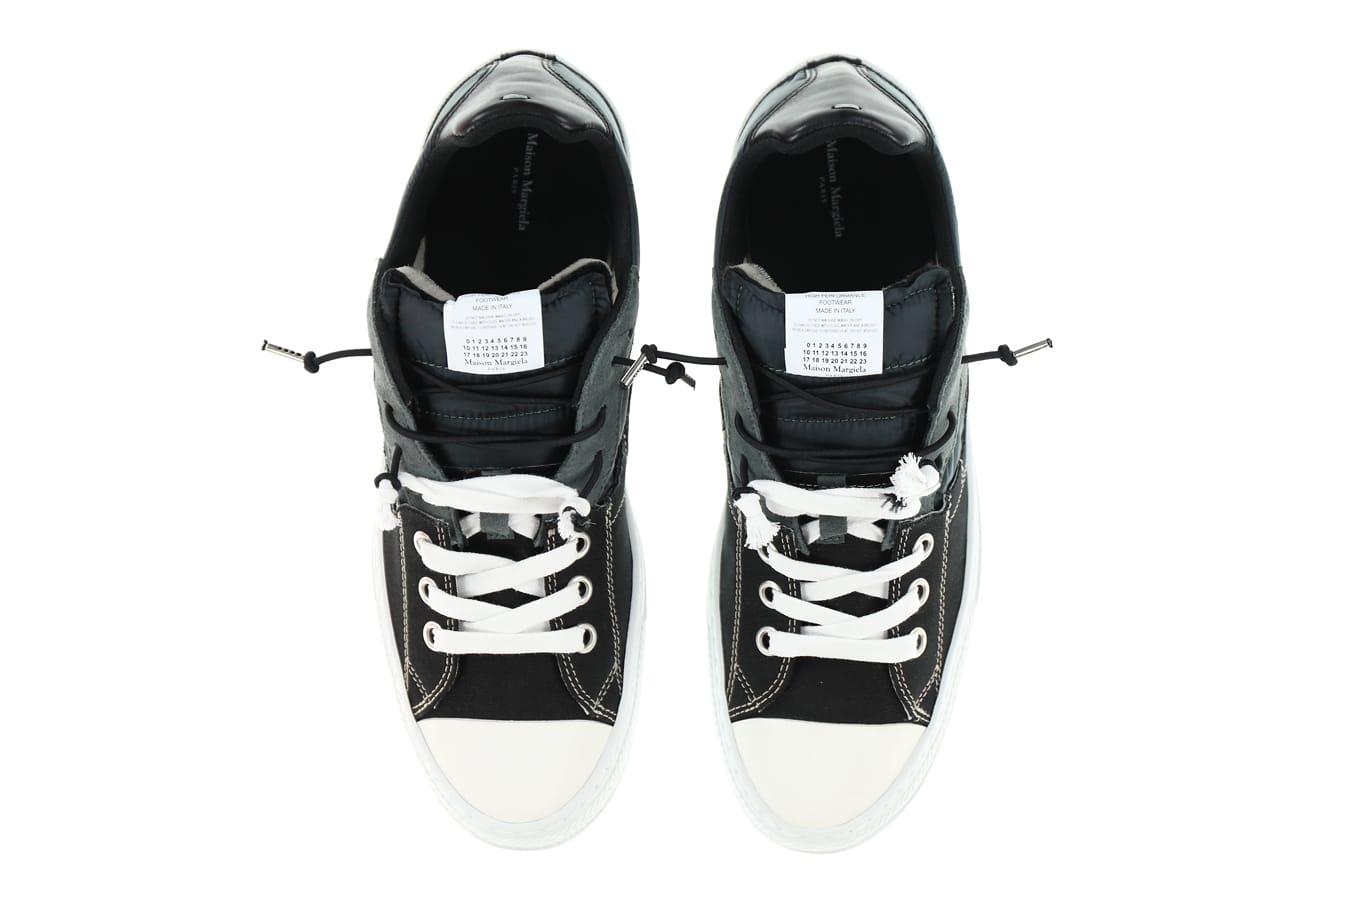 Maison Margiela Repaired New Sneaker